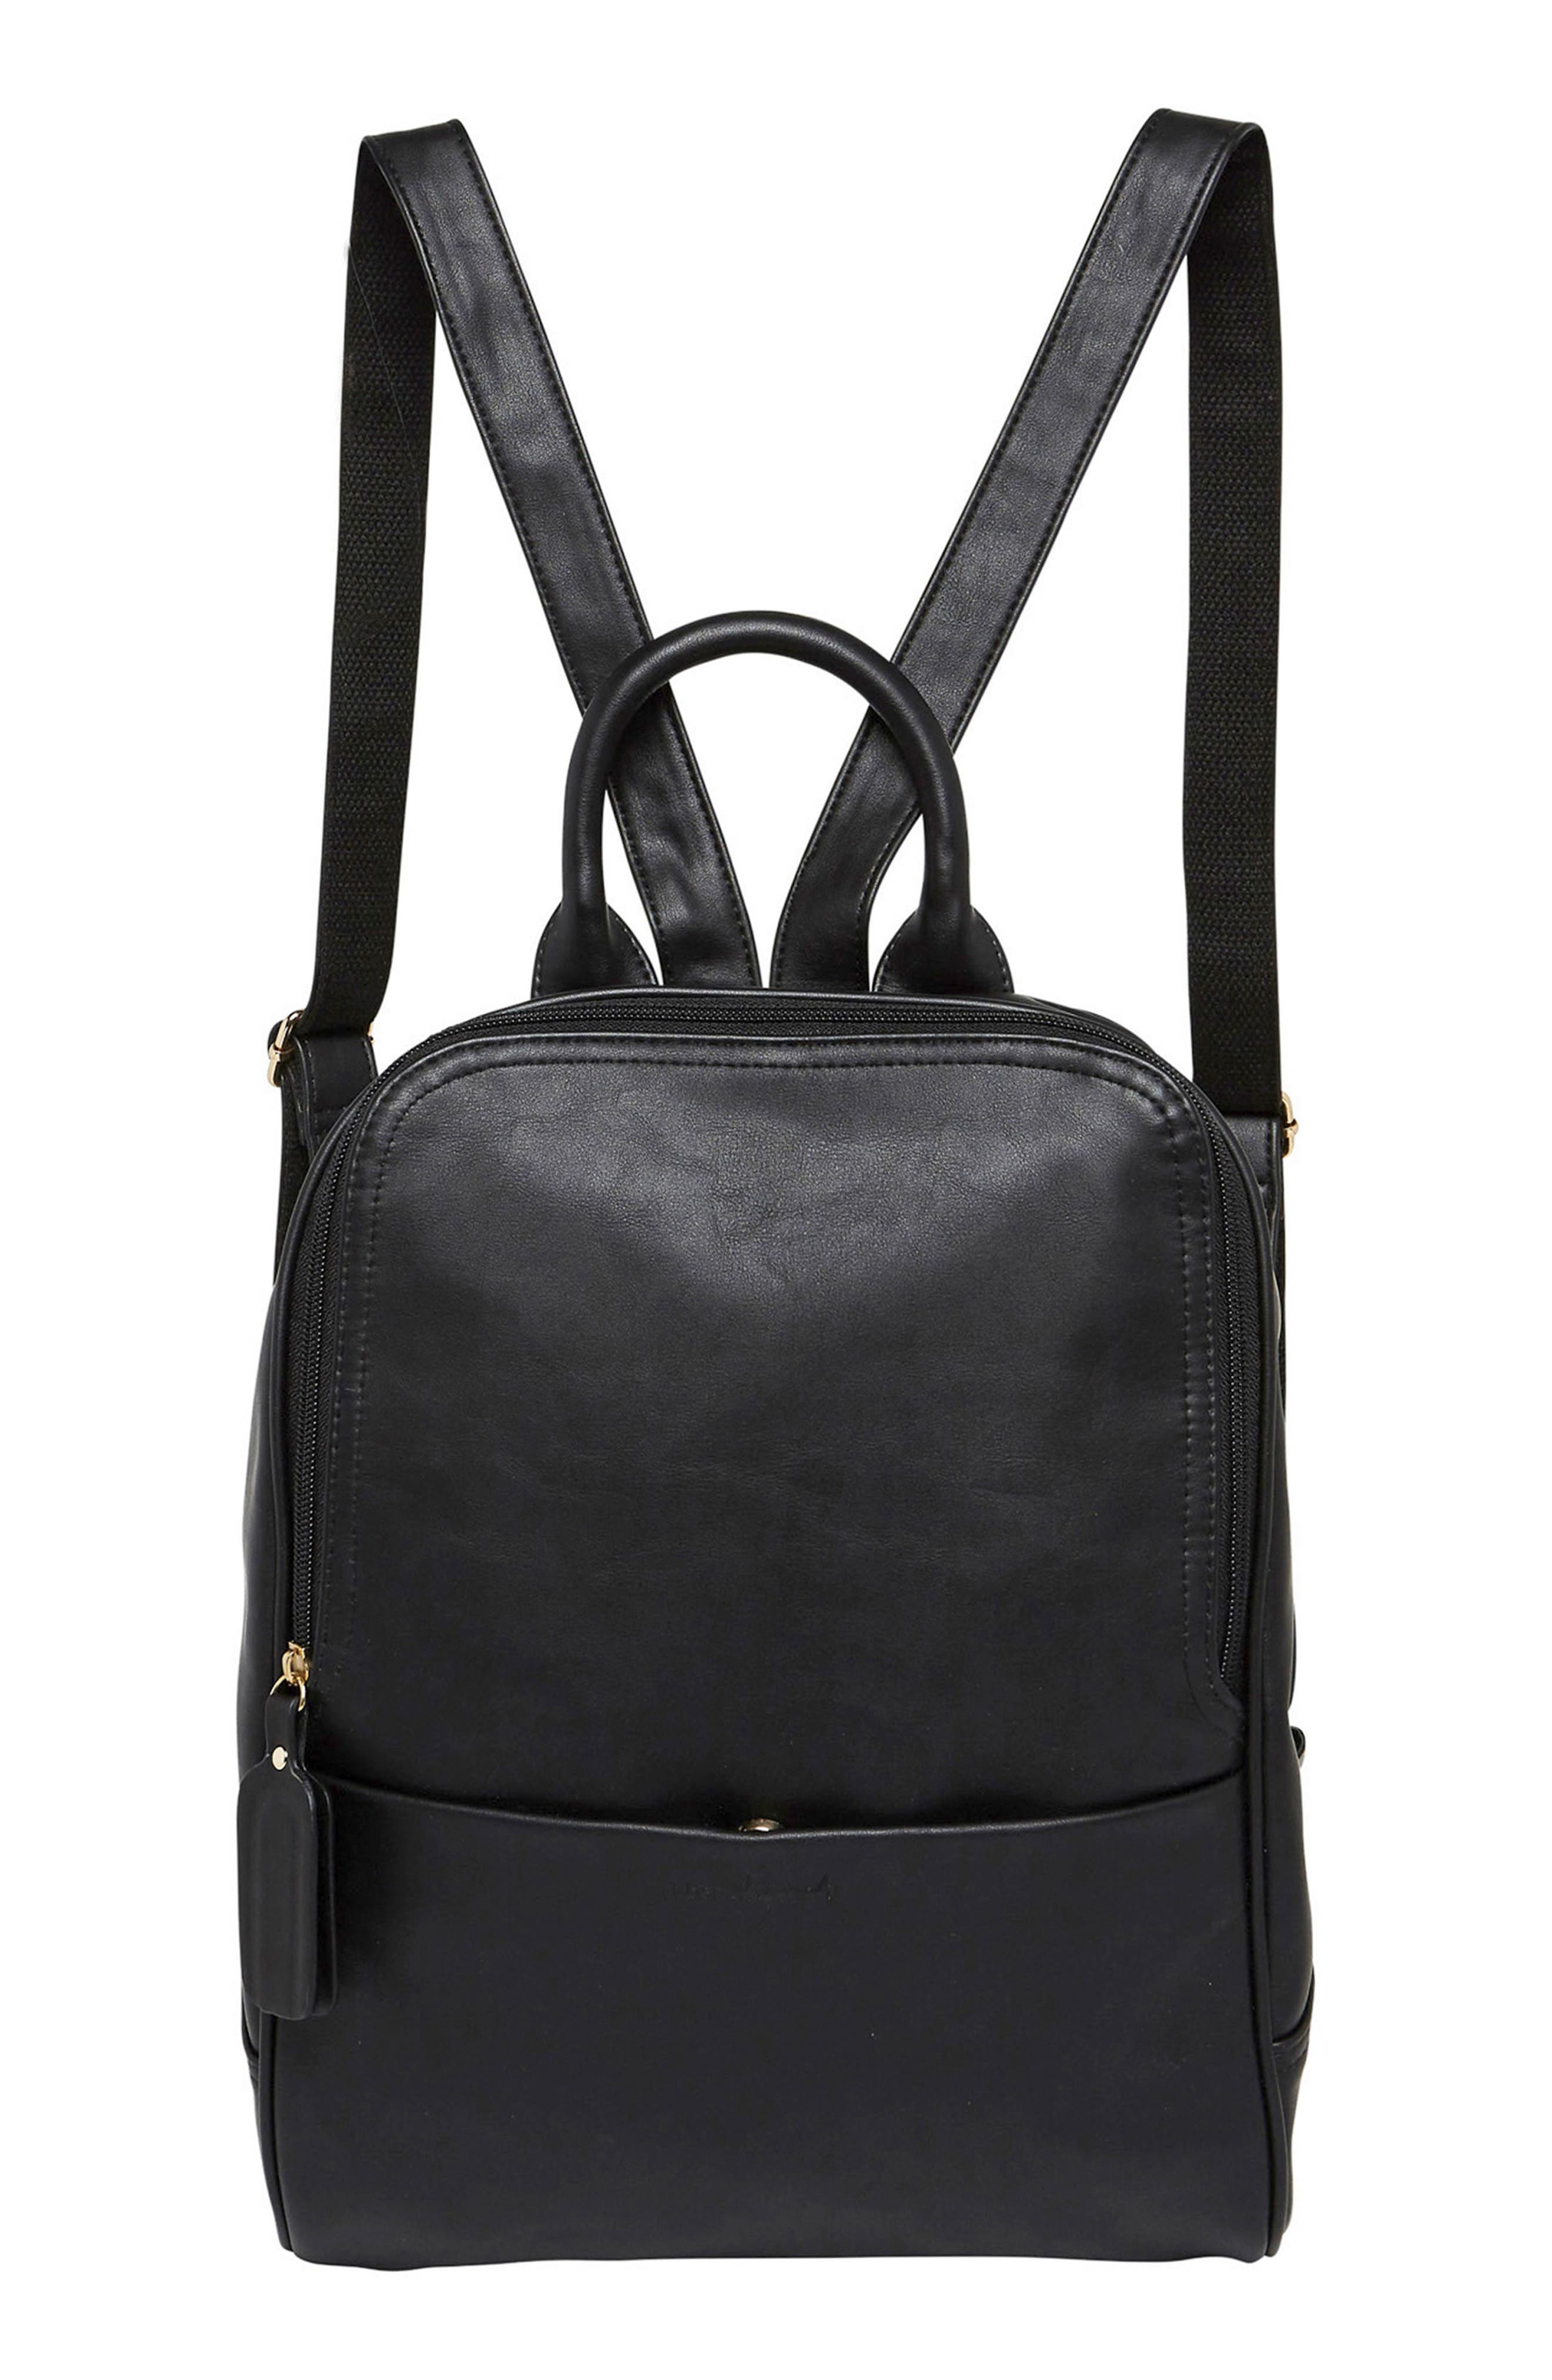 Evolution Vegan Leather Backpack,                             Main thumbnail 1, color,                             BLACK